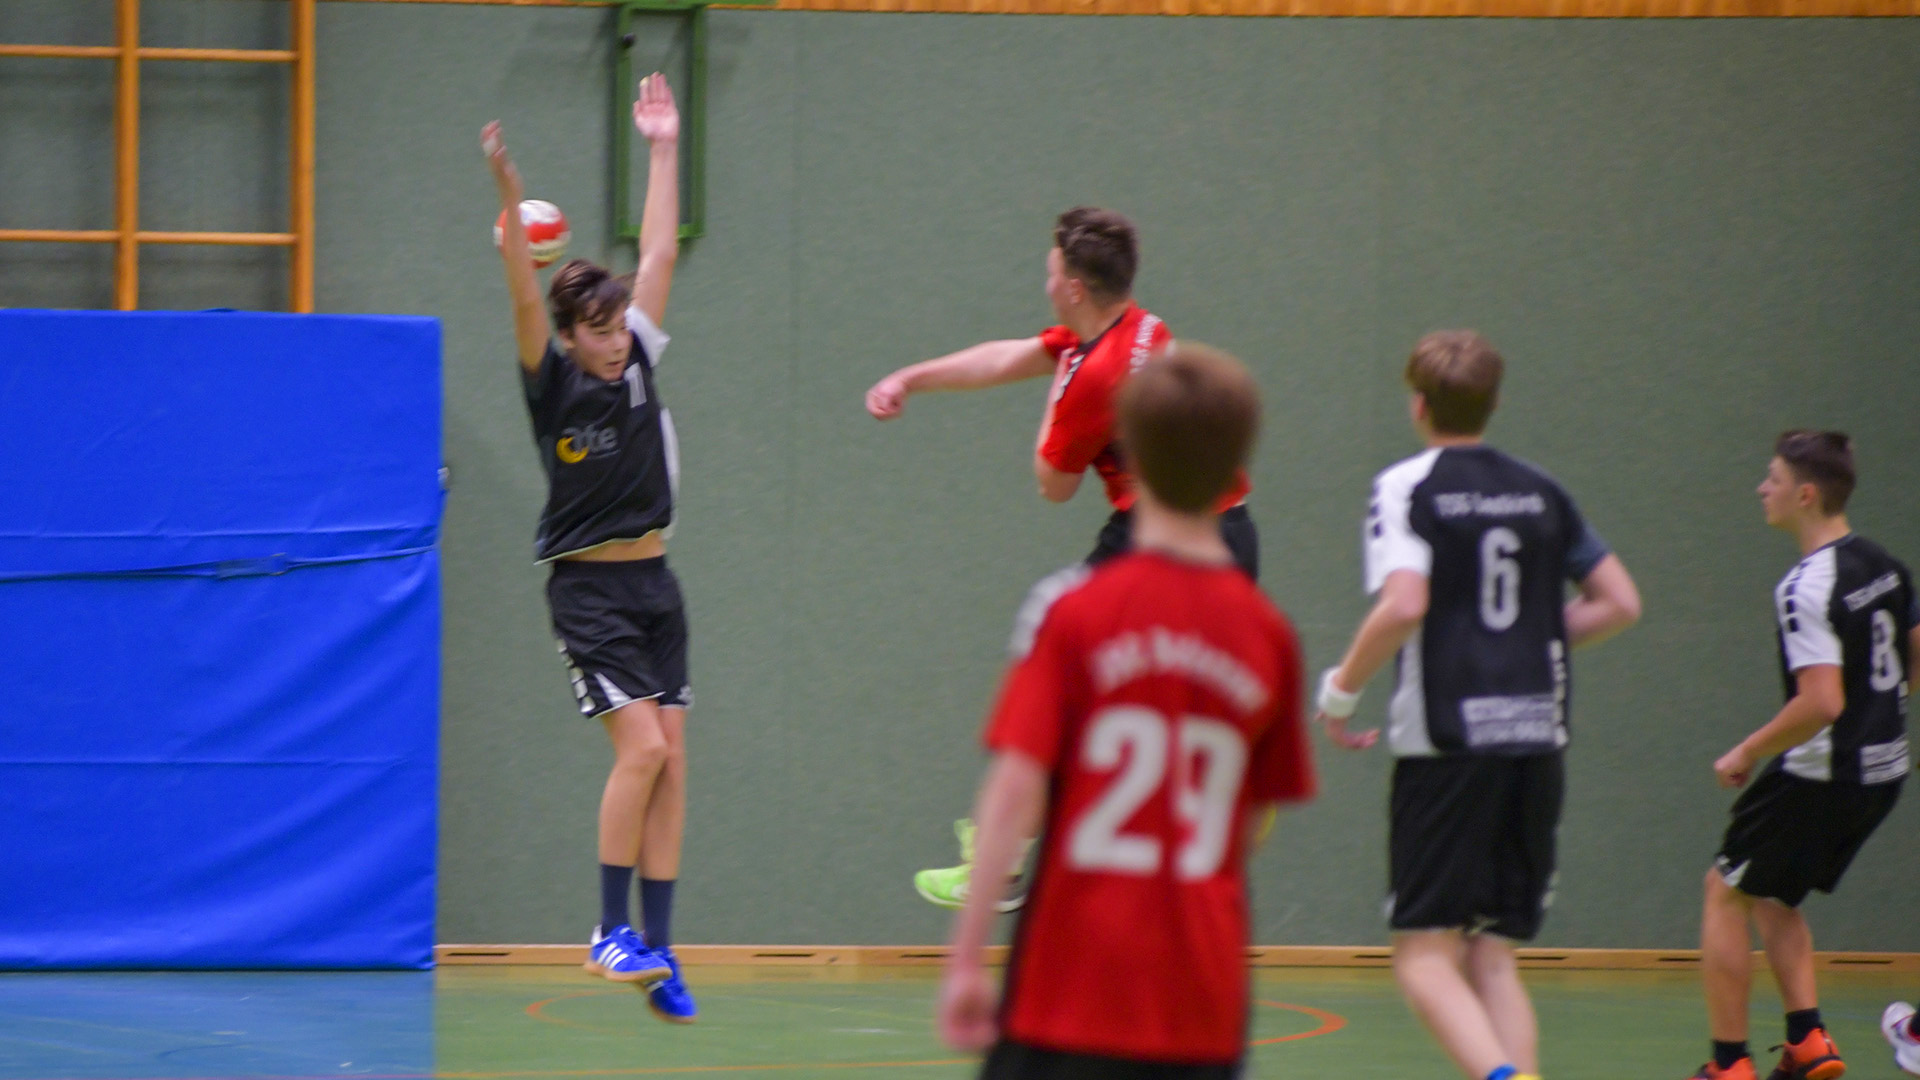 078Slider_mA_tsg_leutkirch_handball